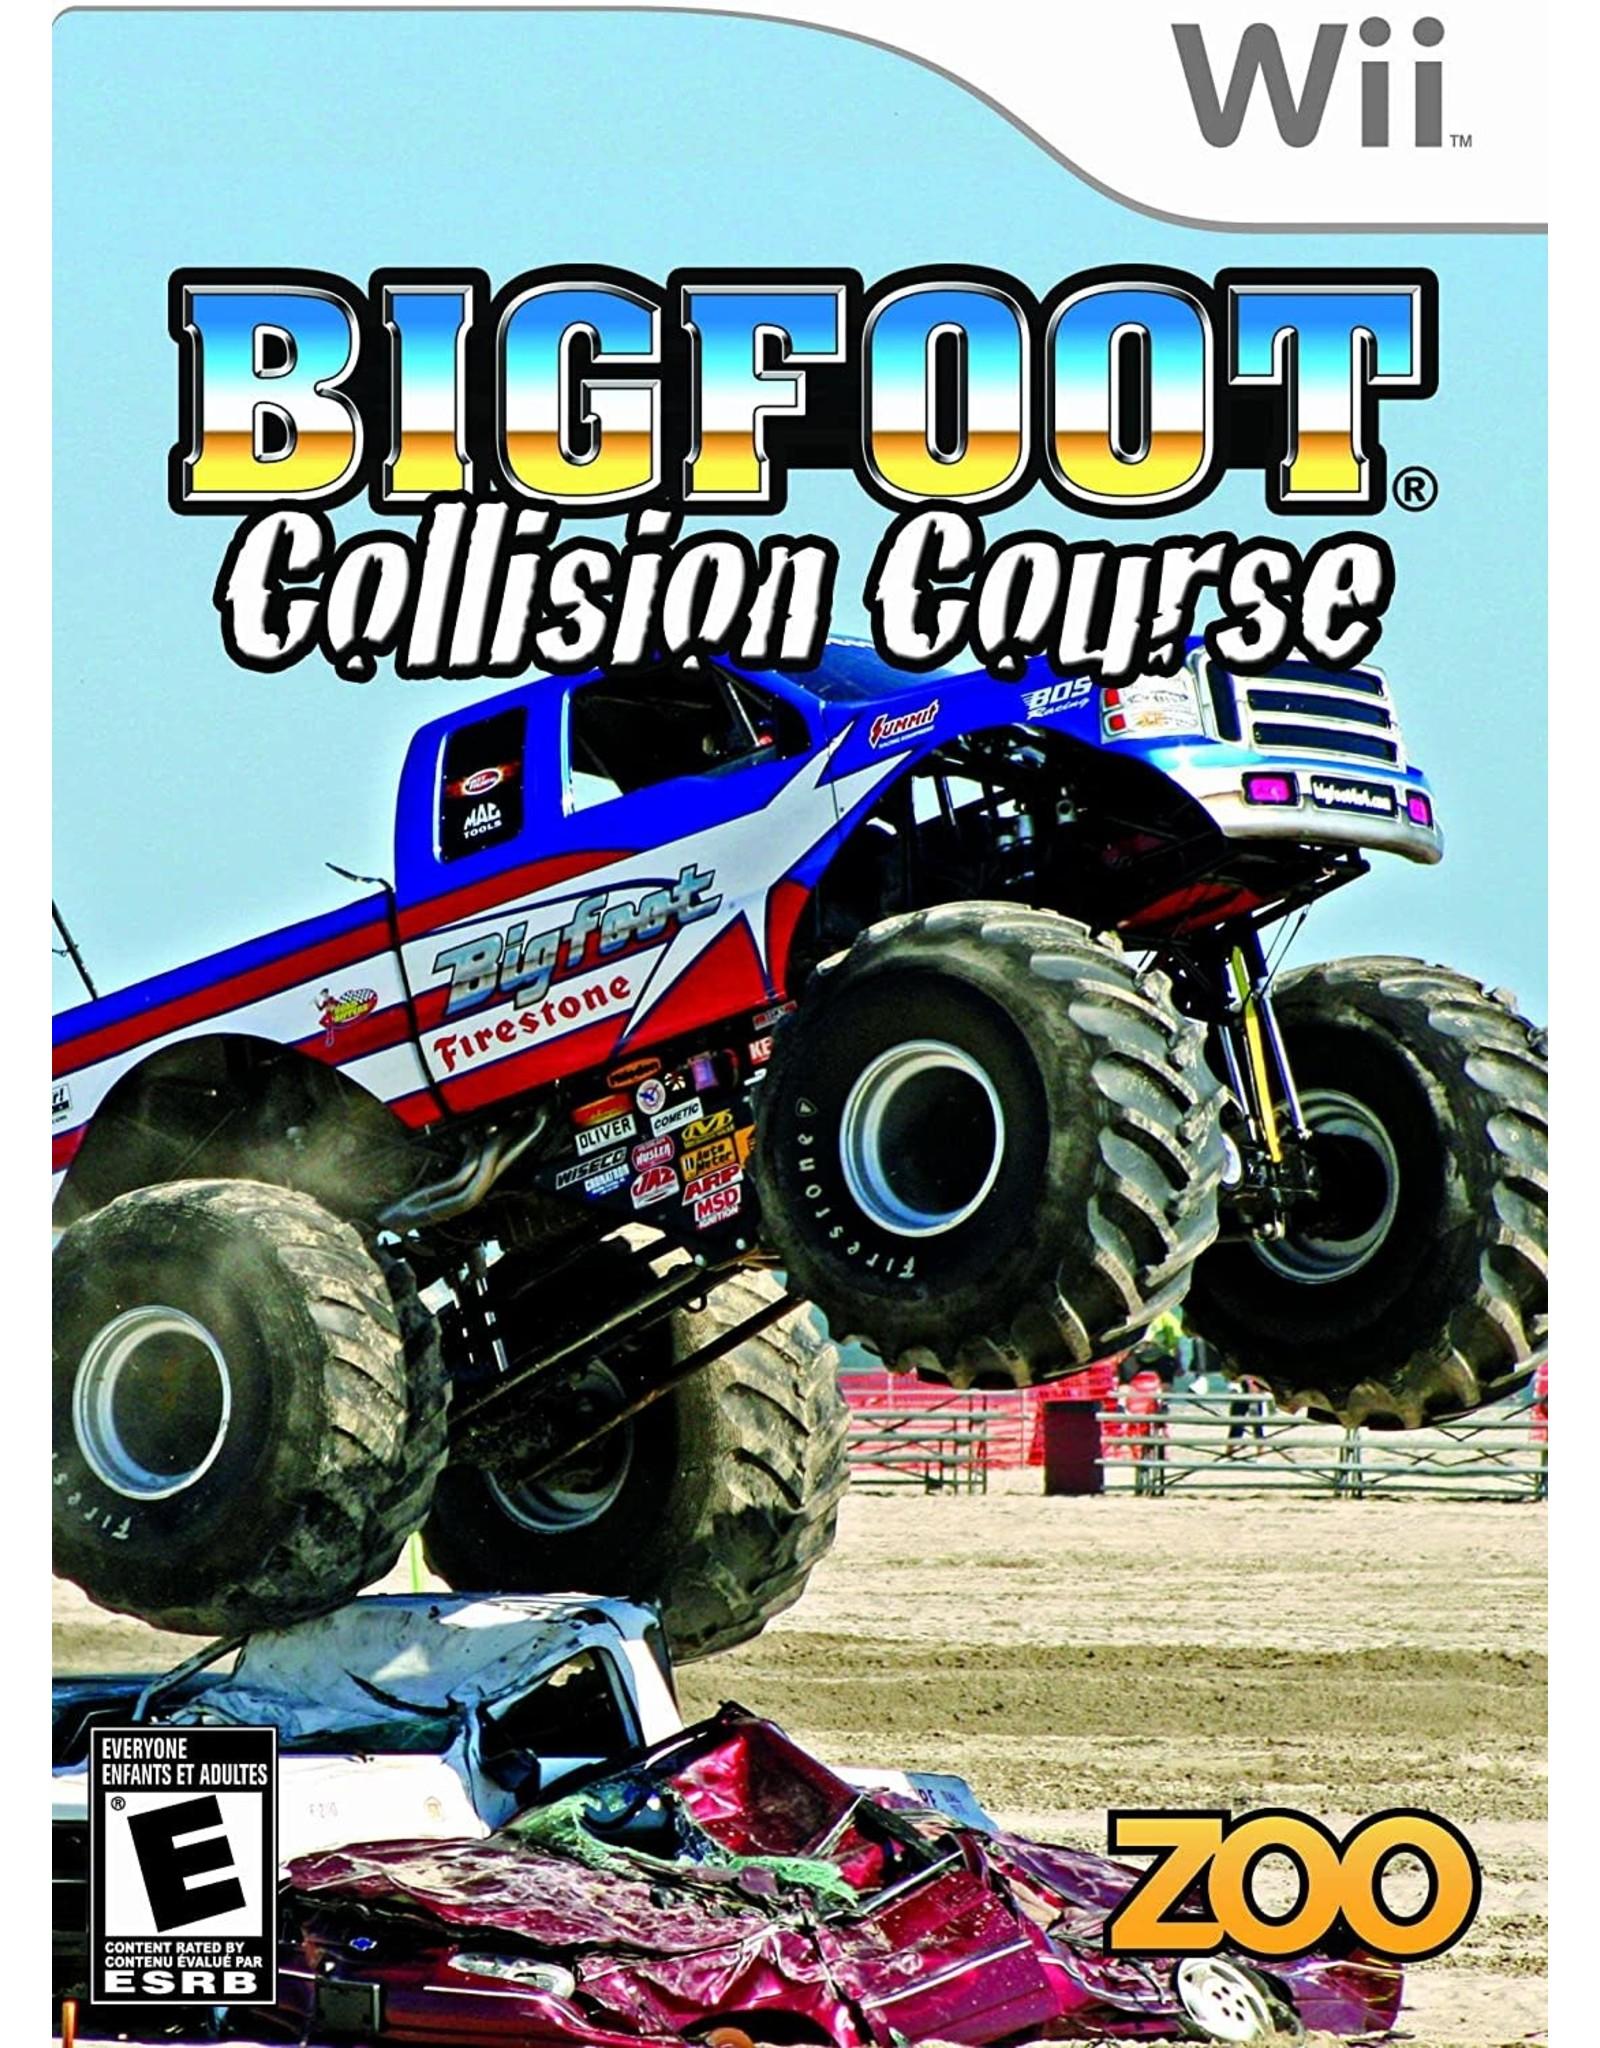 Wii Bigfoot Collision Course (CiB)